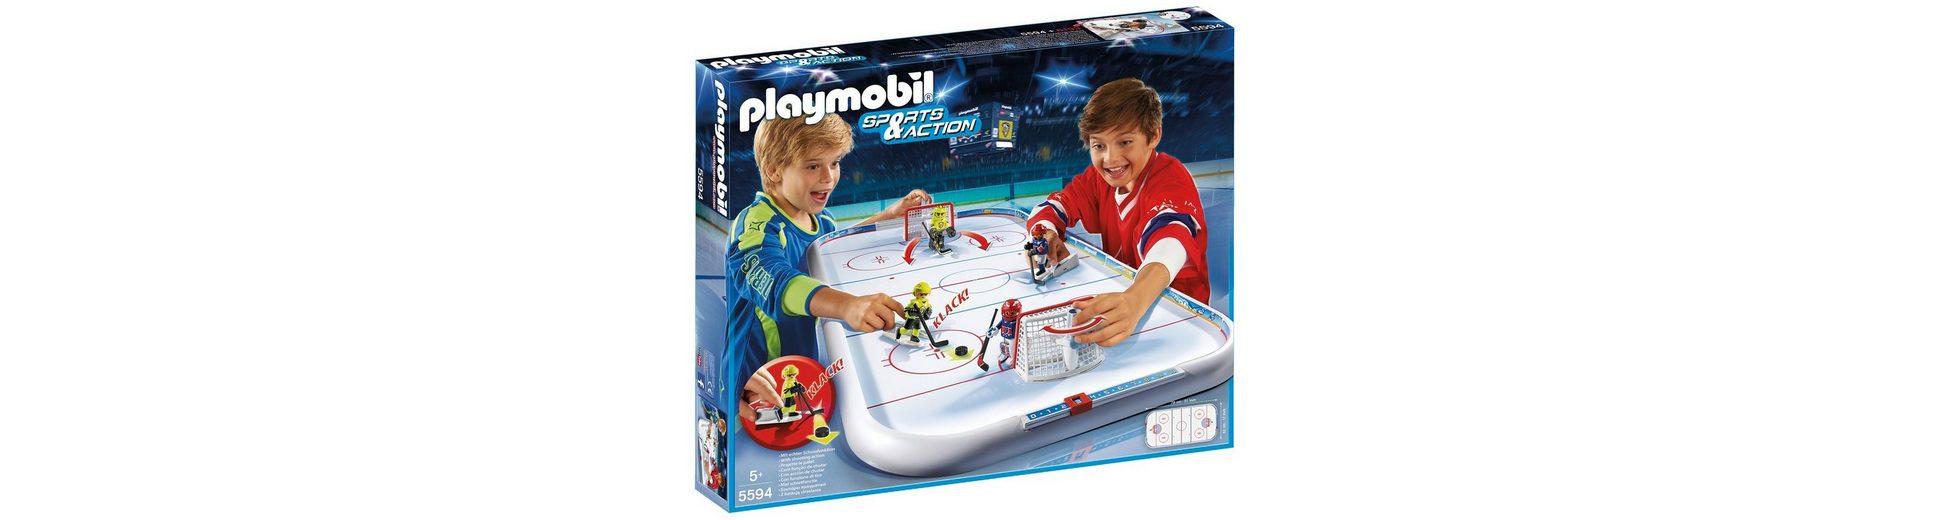 Playmobil® Eishockey-Arena (5594), Sports & Action